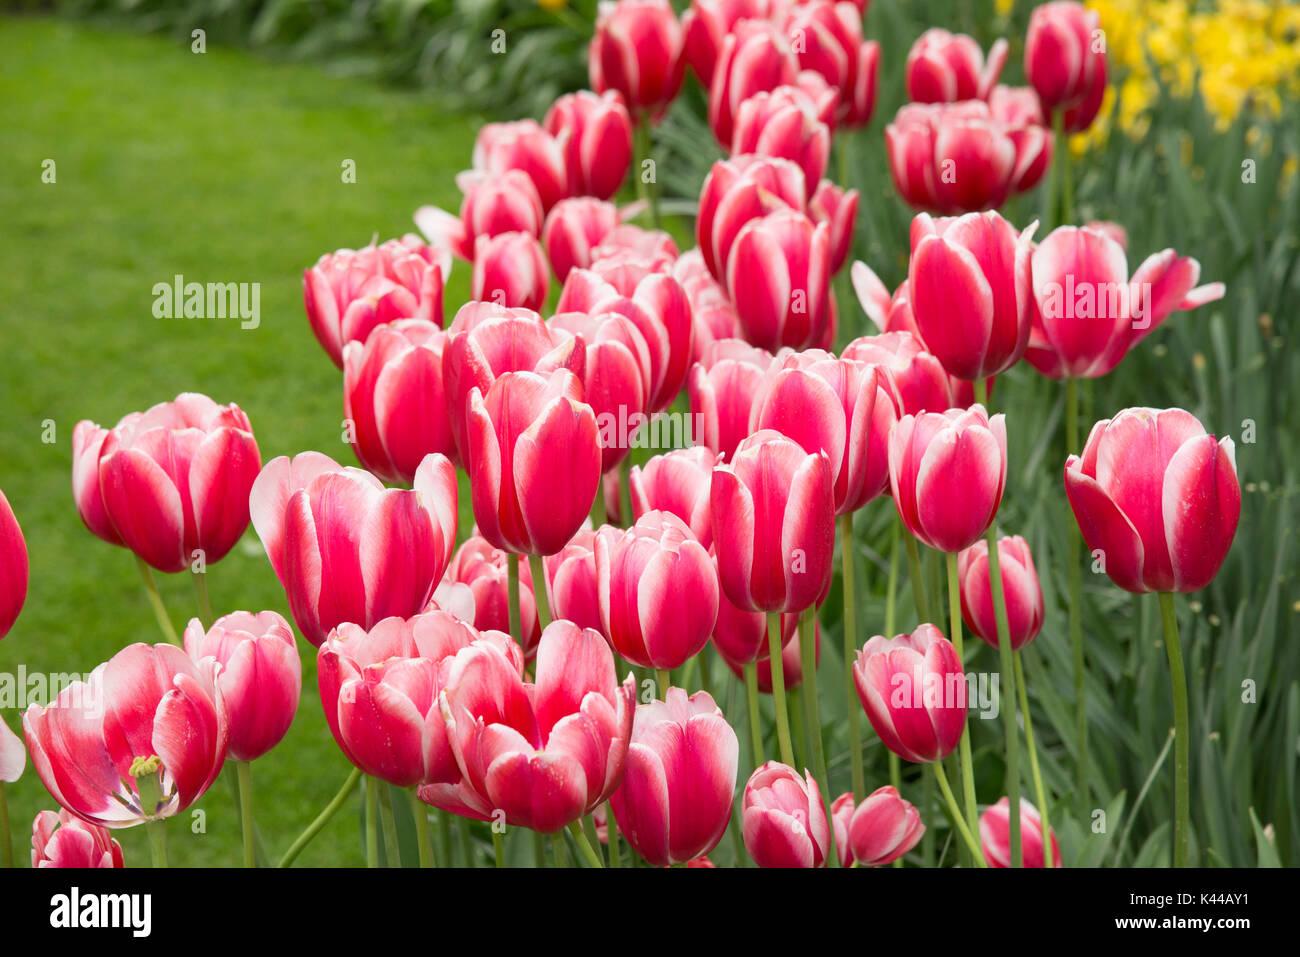 Fiori Nel Mondo.Fioriture Di Fiori Al Parco Keukenhof Nei Paesi Bassi Questo